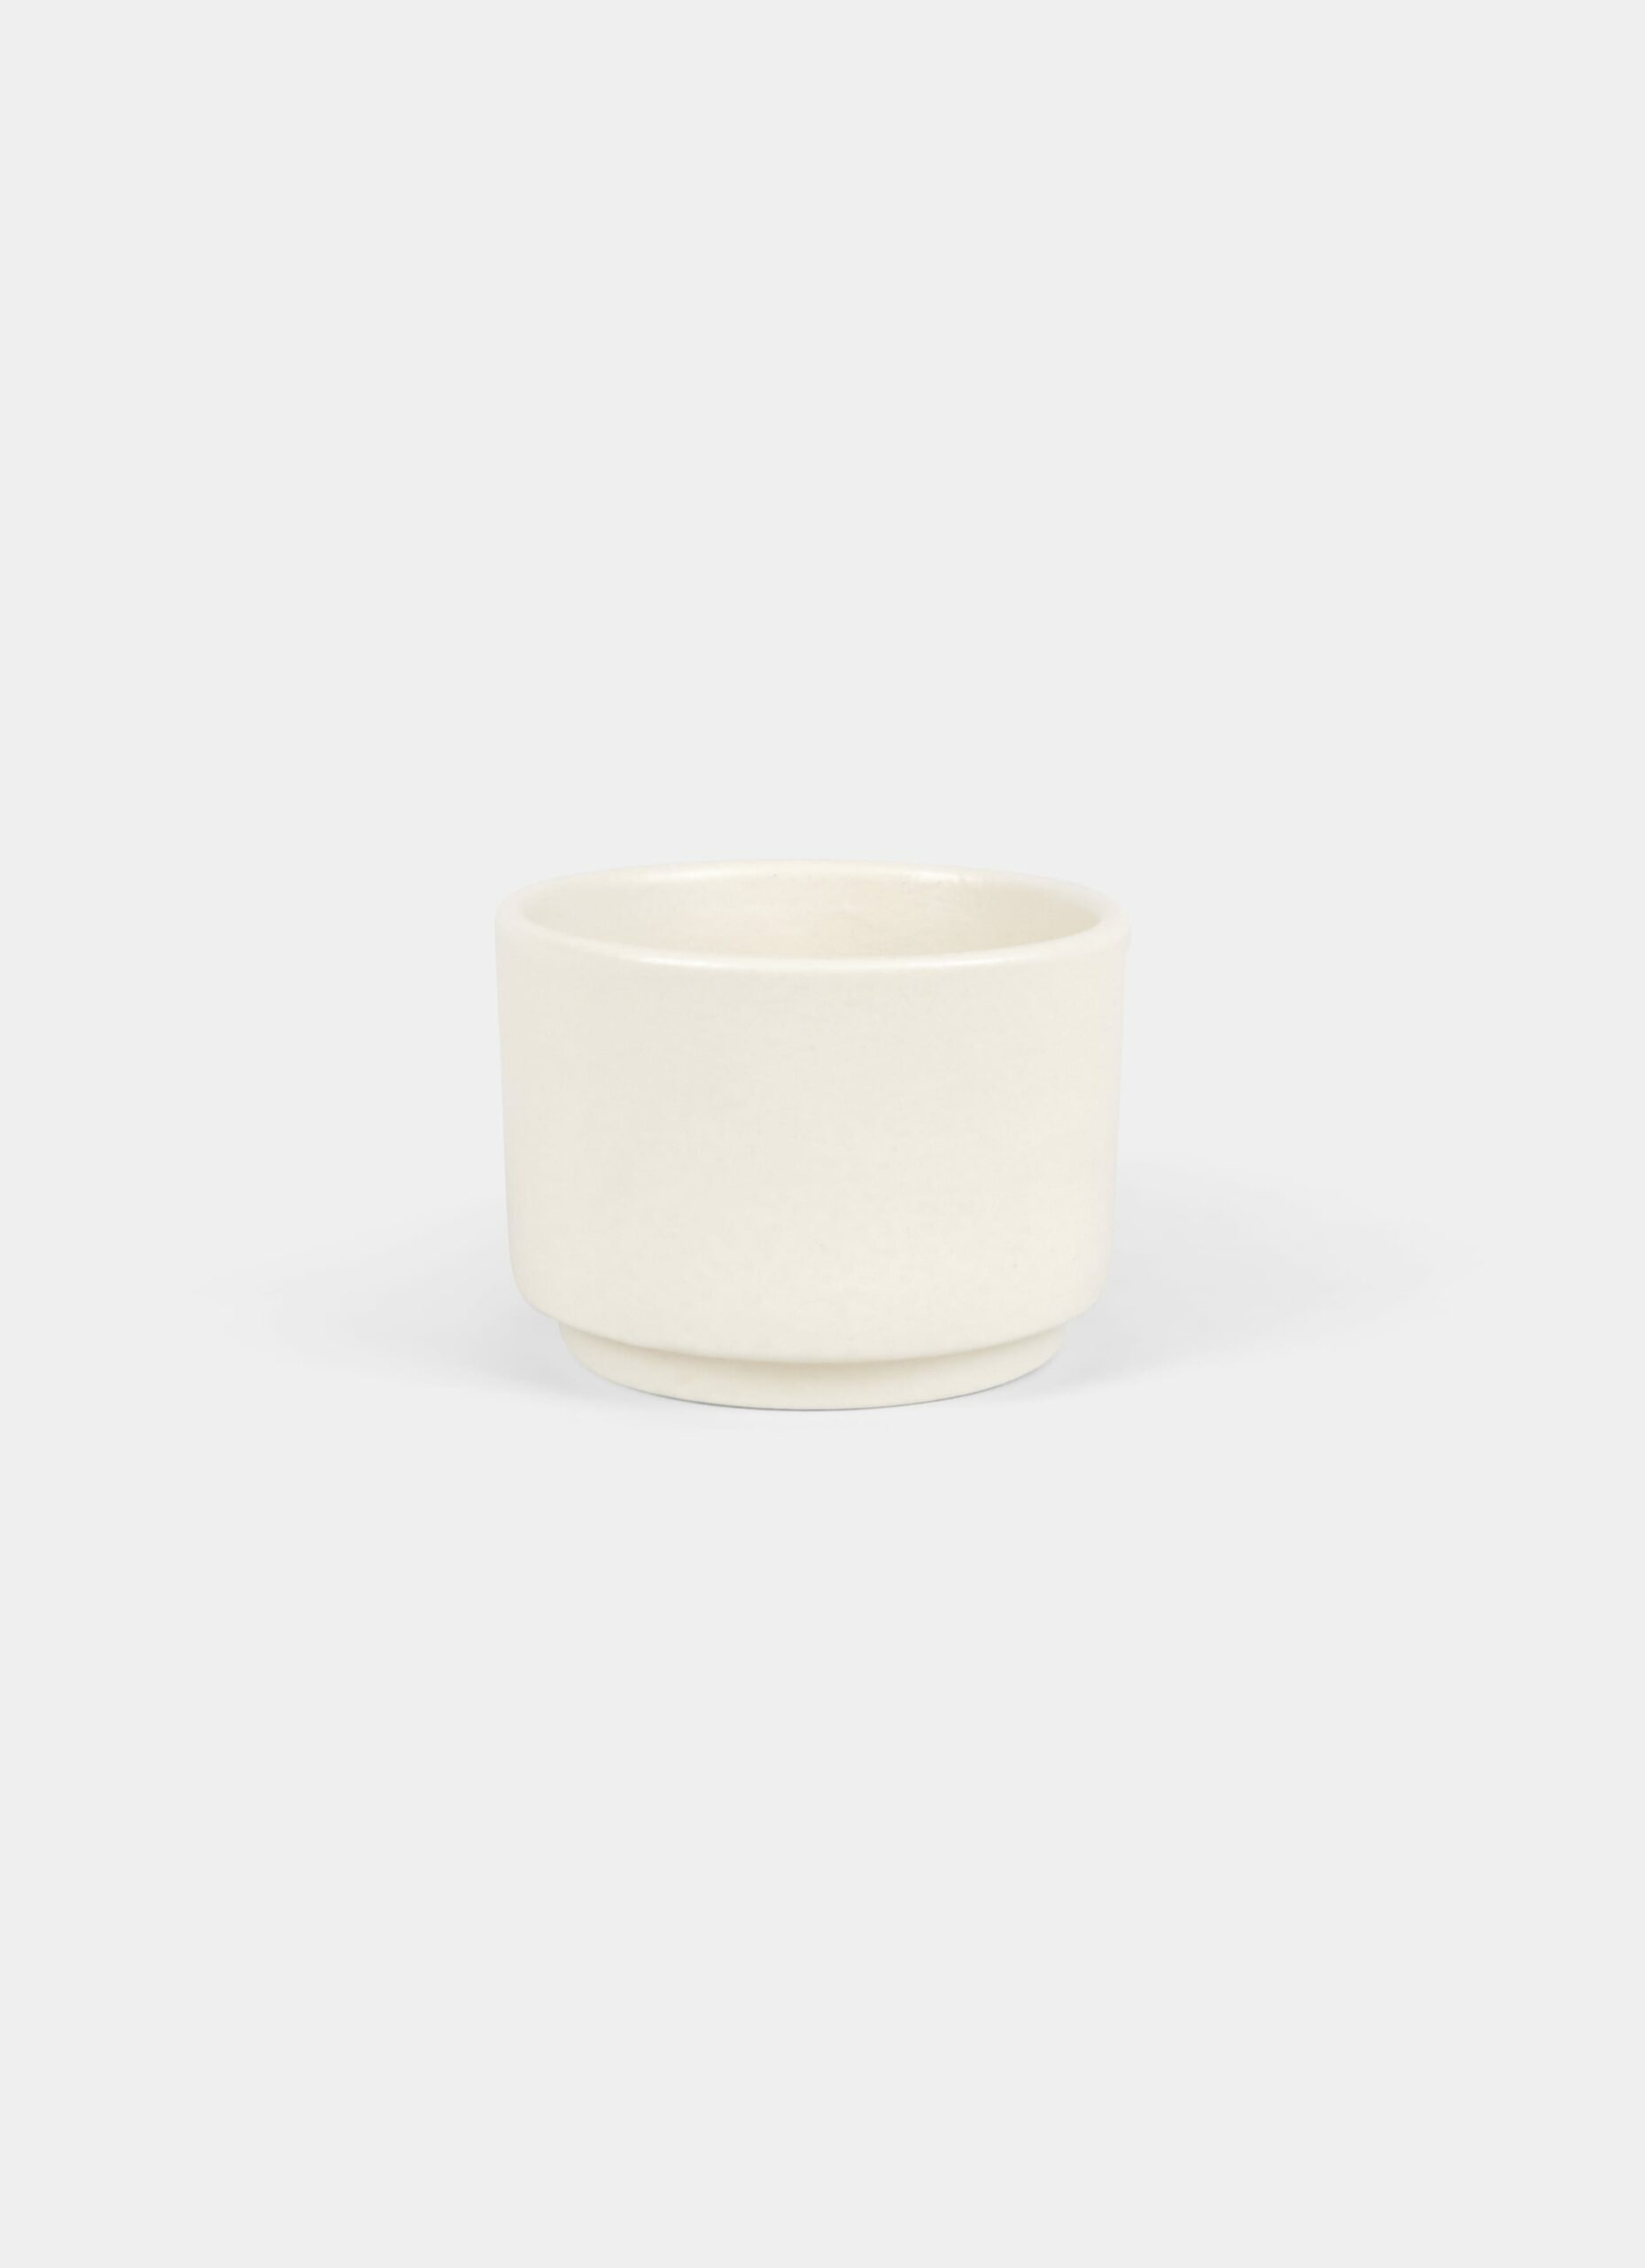 Frama - Otto Stoneware Mug - Natural